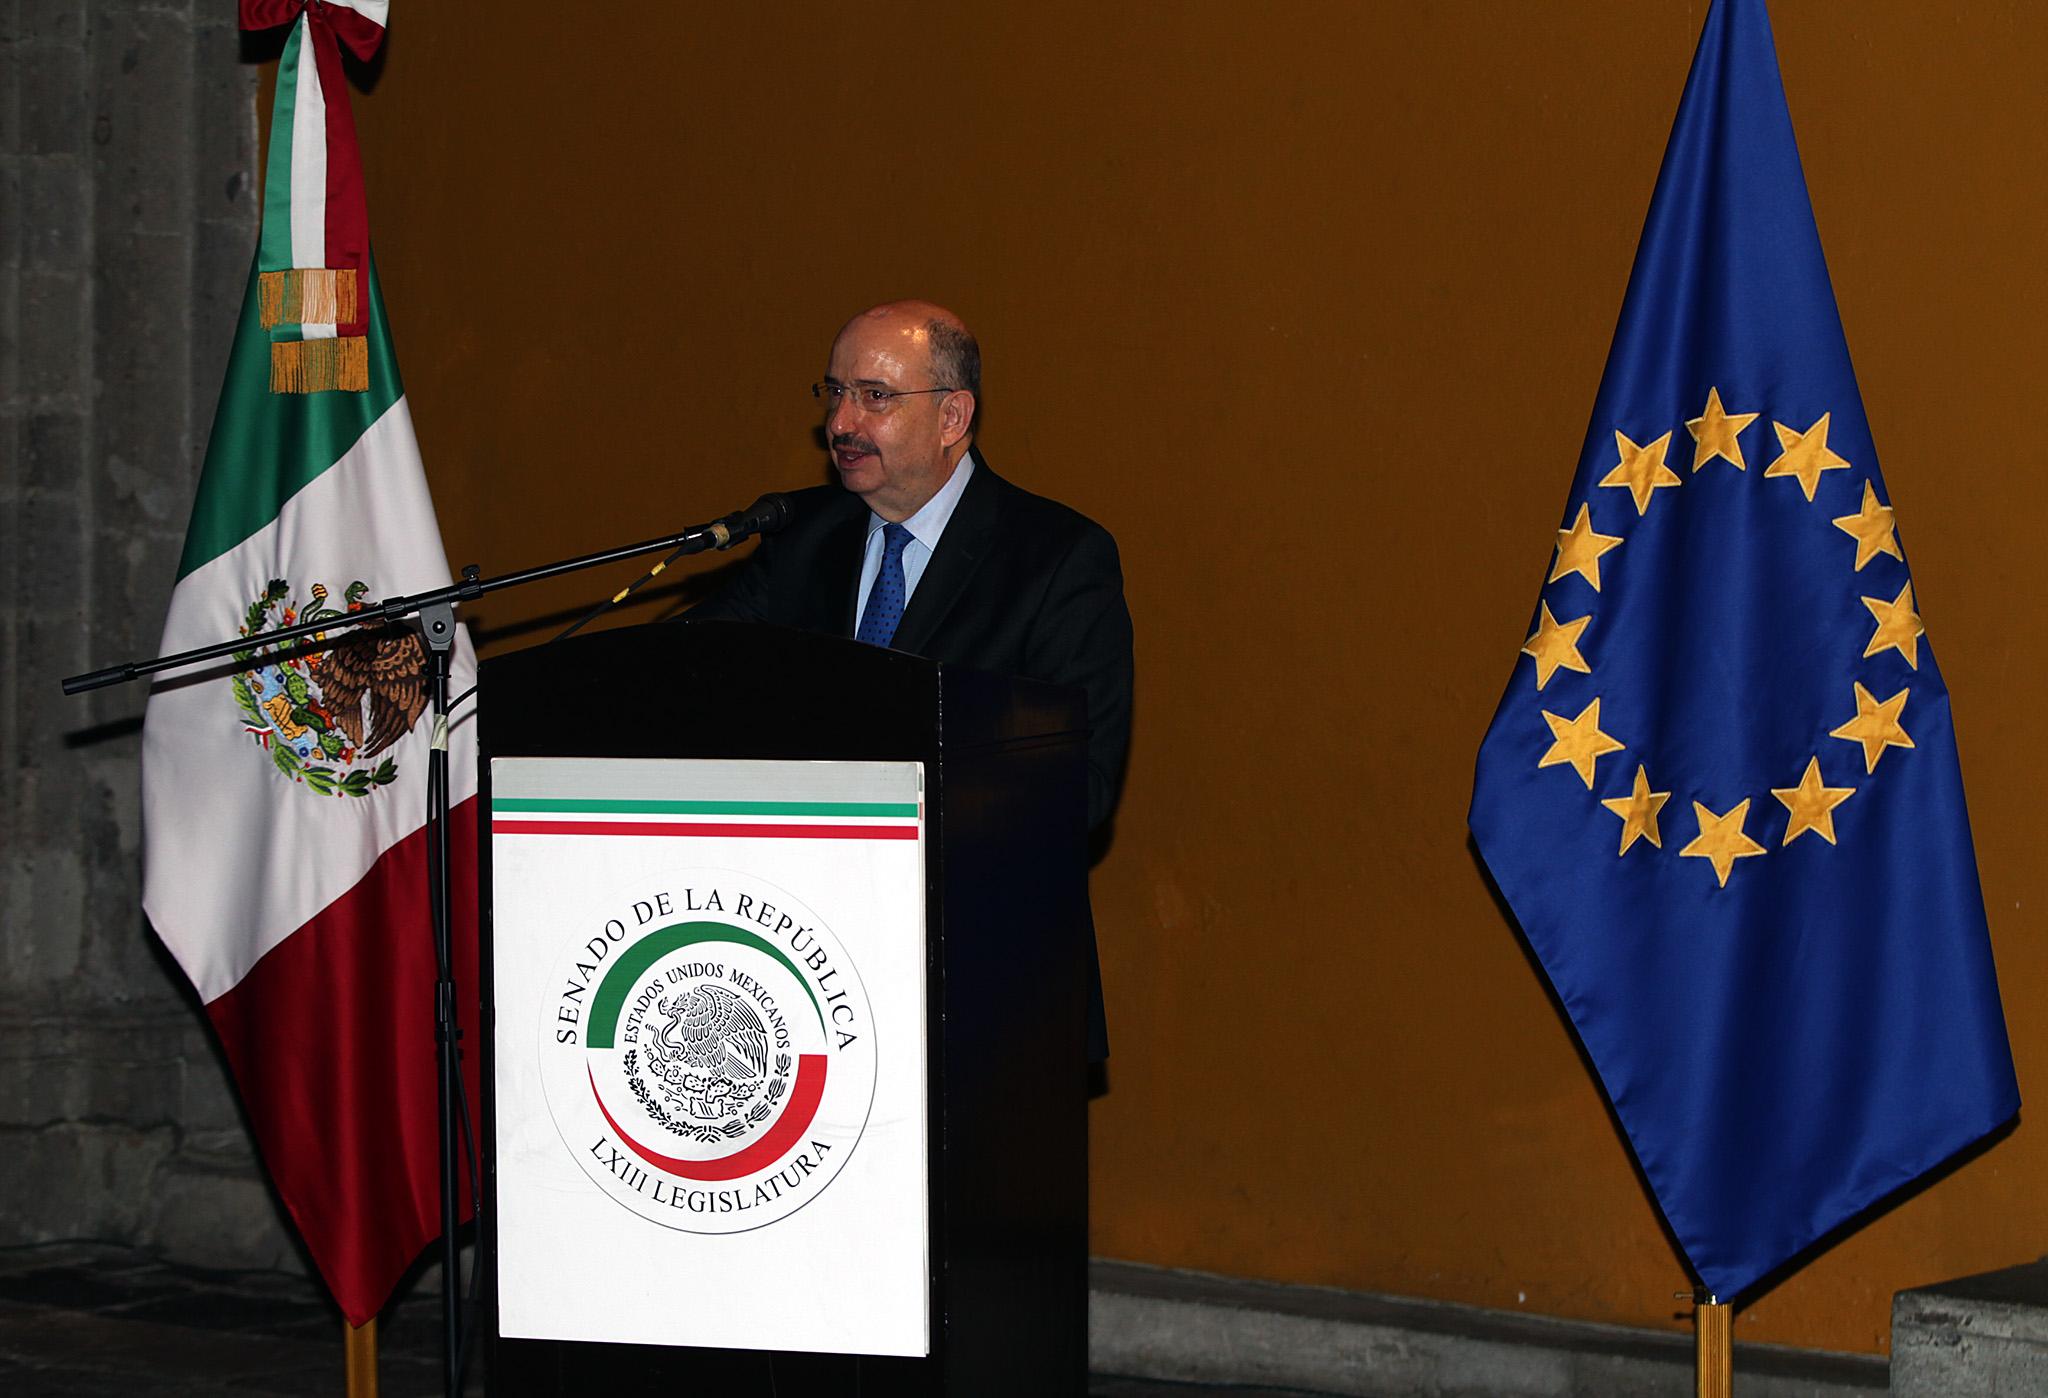 FOTO 1 Inician trabajos de la XX Reuni n de la Comisi n Parlamentaria Mixta M xico Uni n Europeajpg